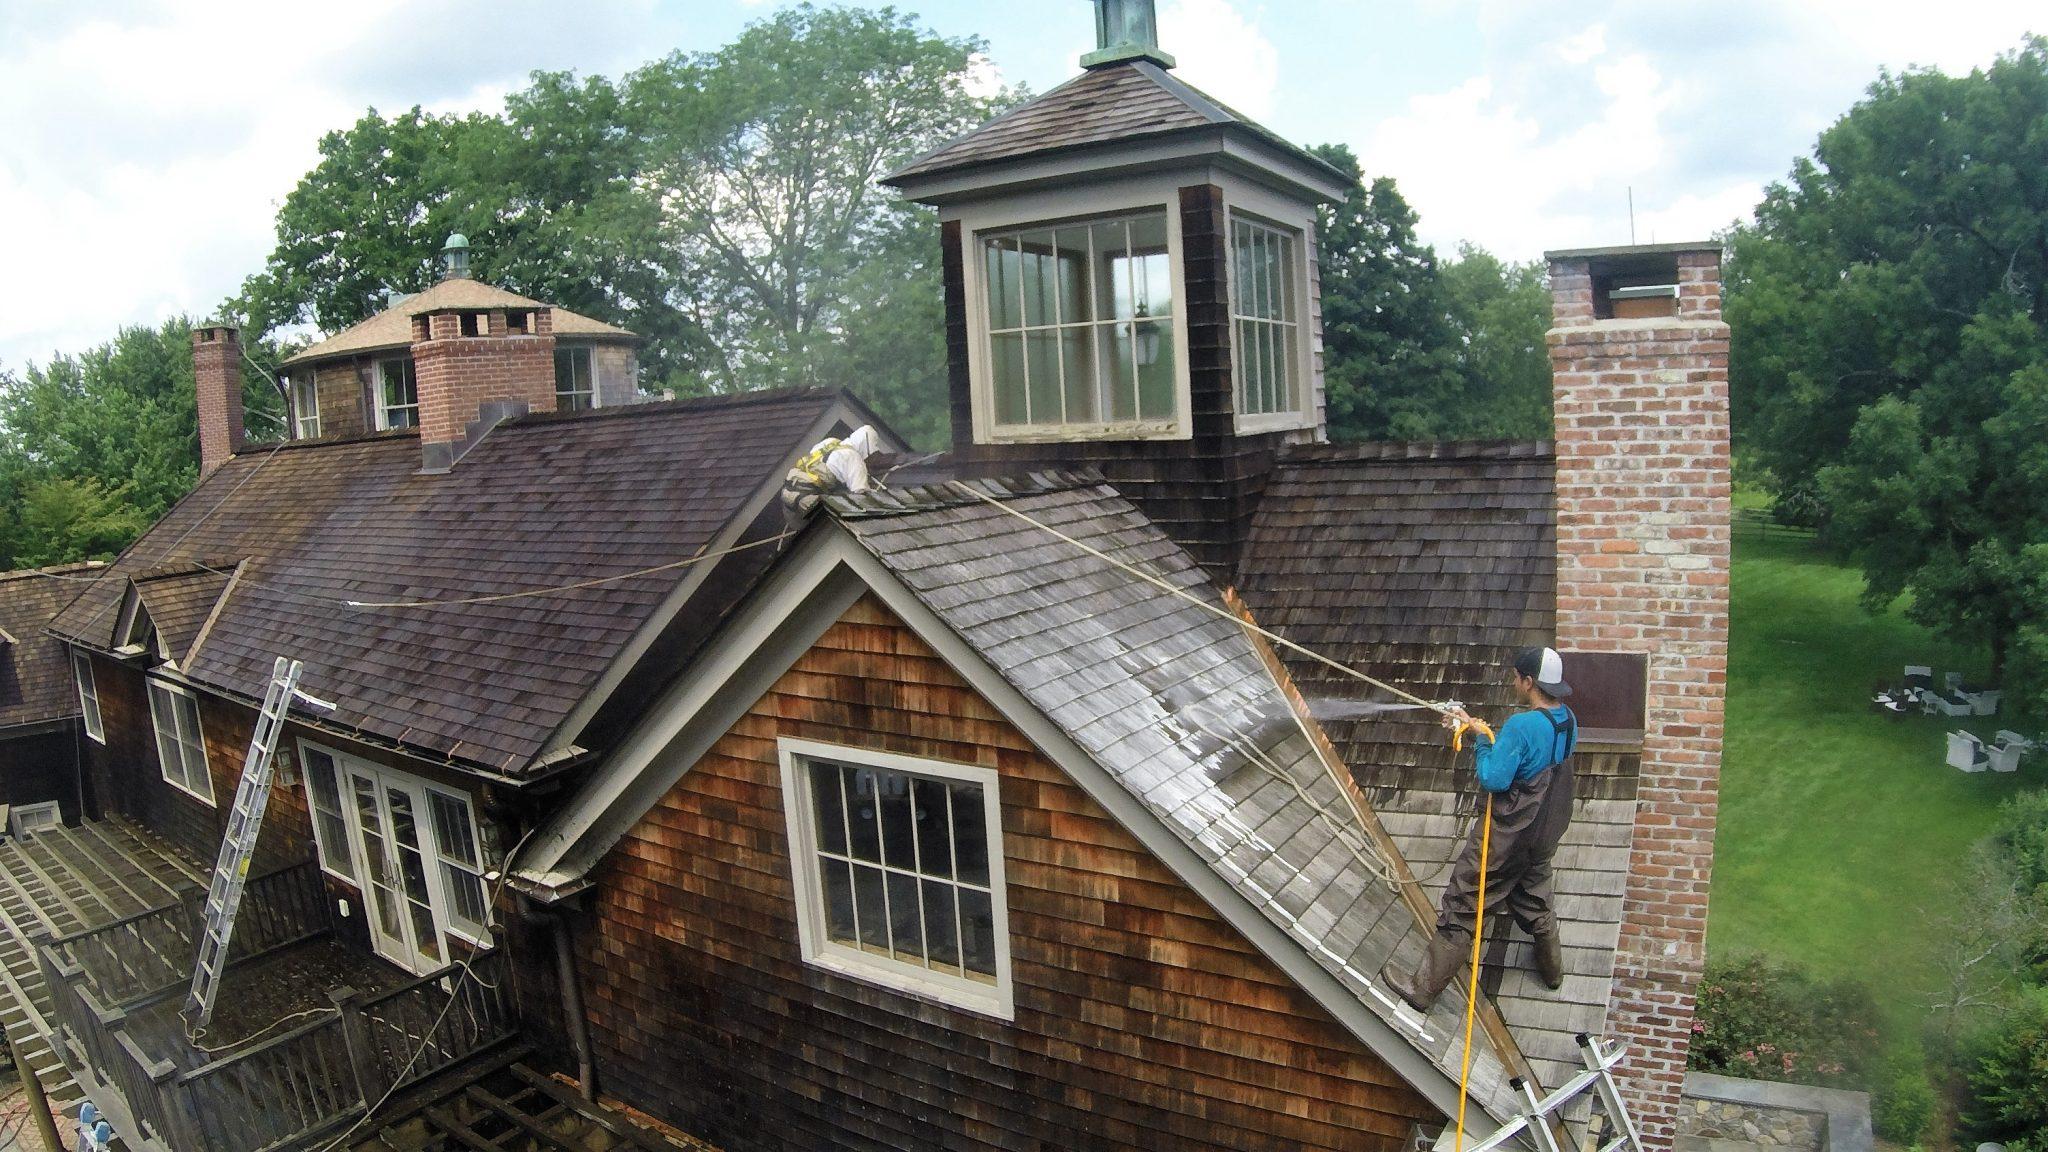 Waccabuc, NY Cedar Roof Repair